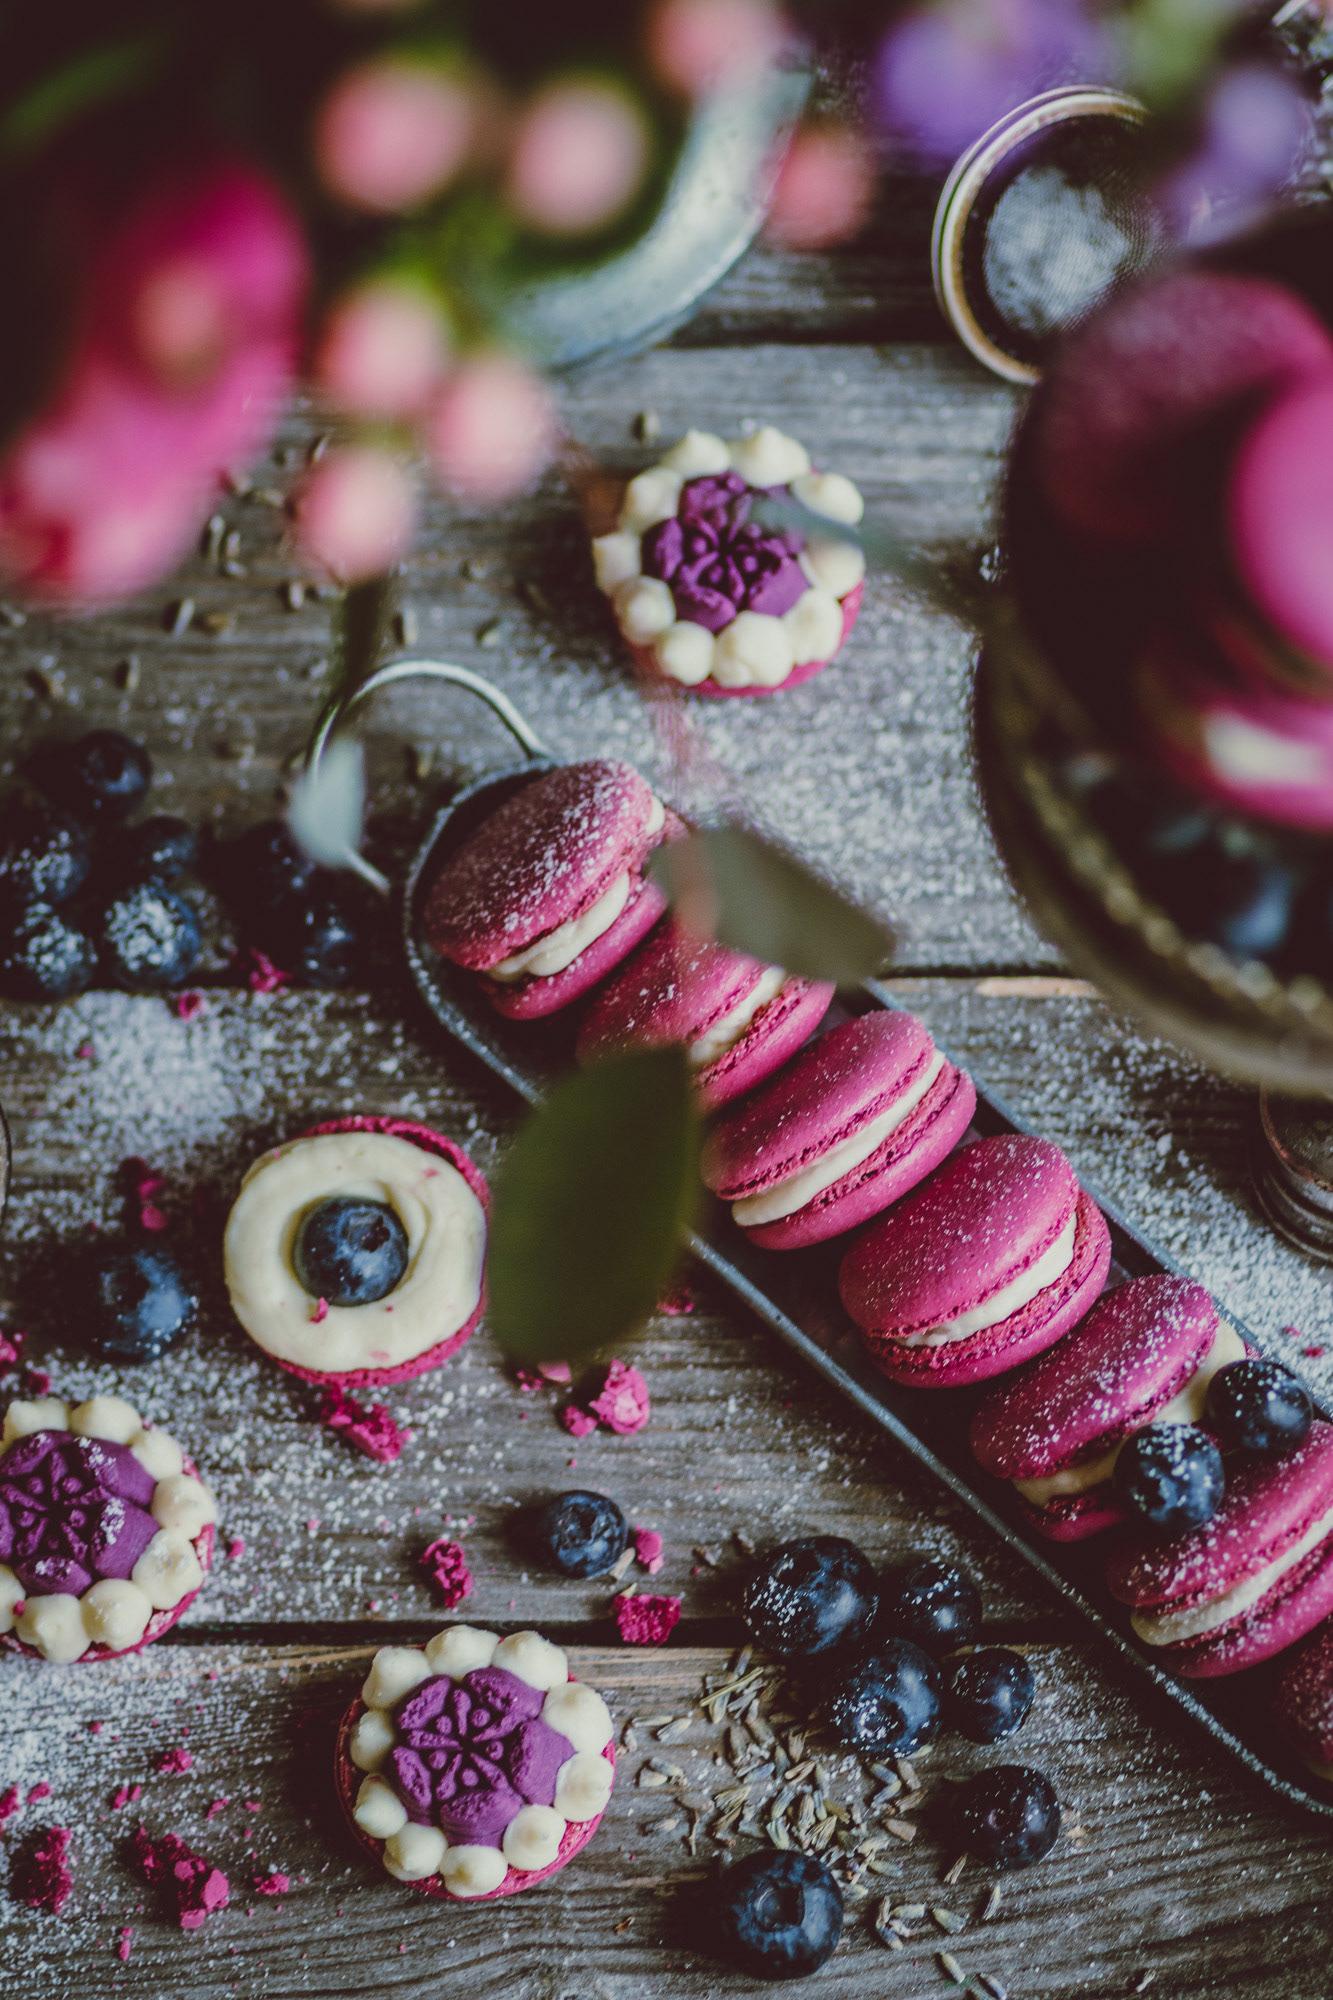 afternoon with macarons/ фотограф Amalija Andersone